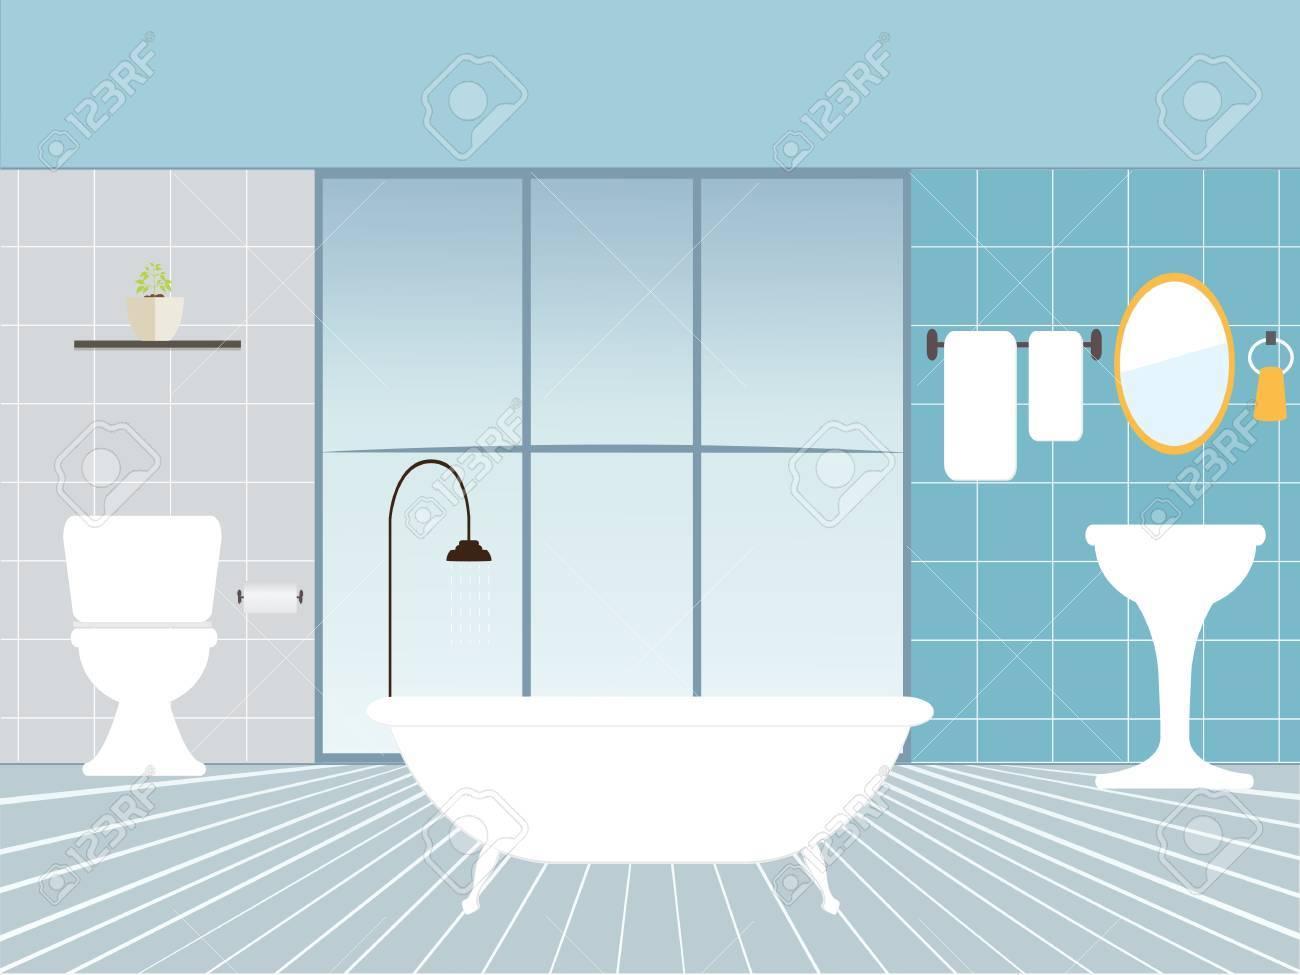 Flat design vector illustration of modern bathroom interior with..